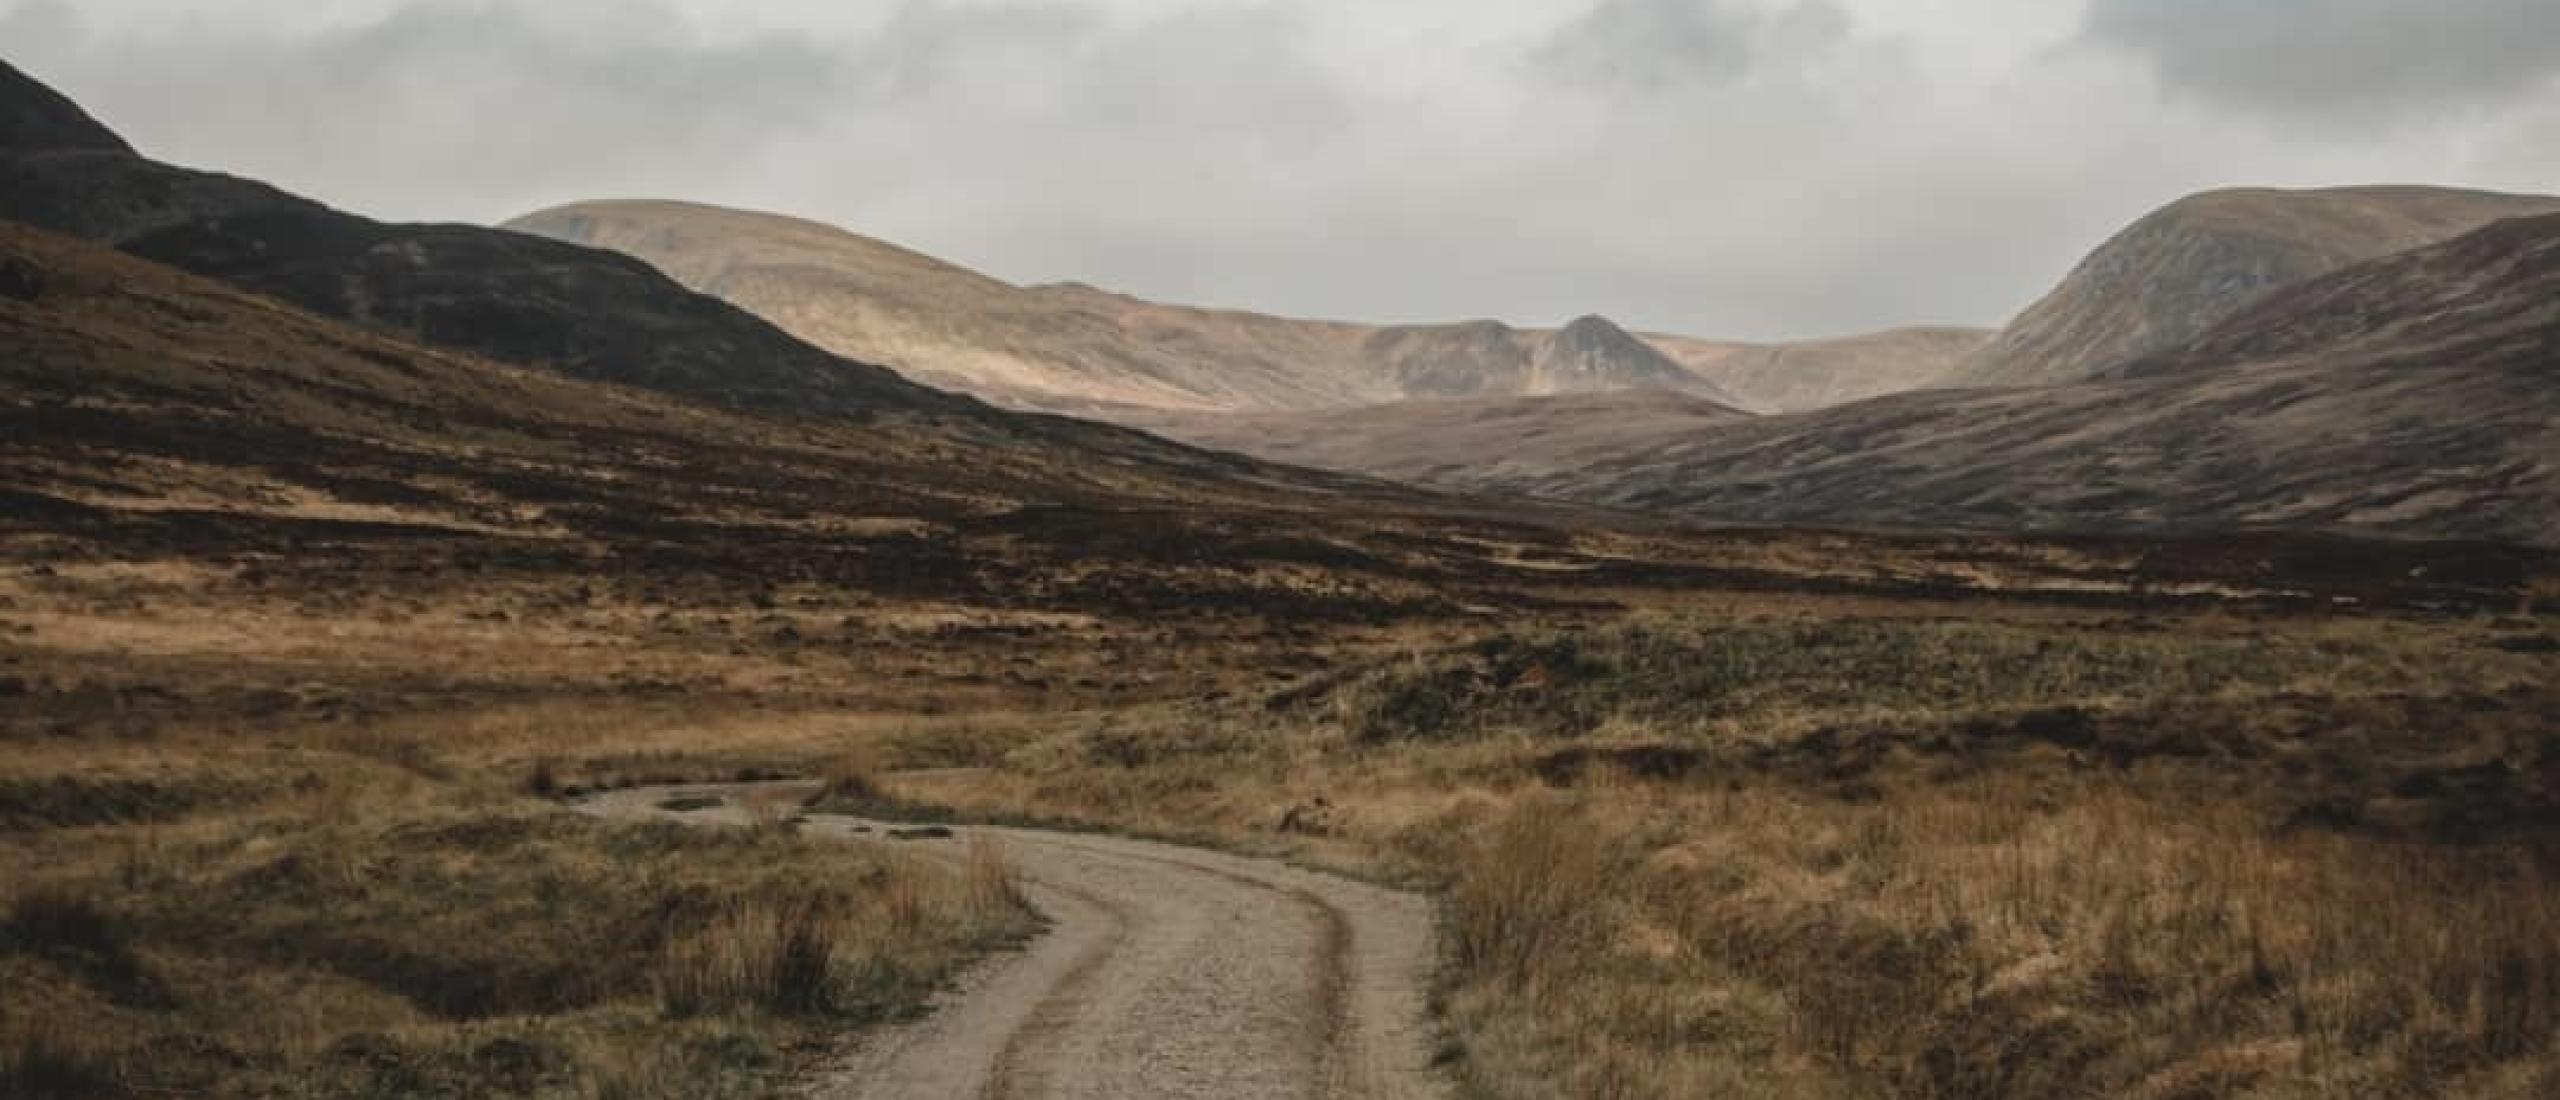 East Highland Way vs. West Highland Way